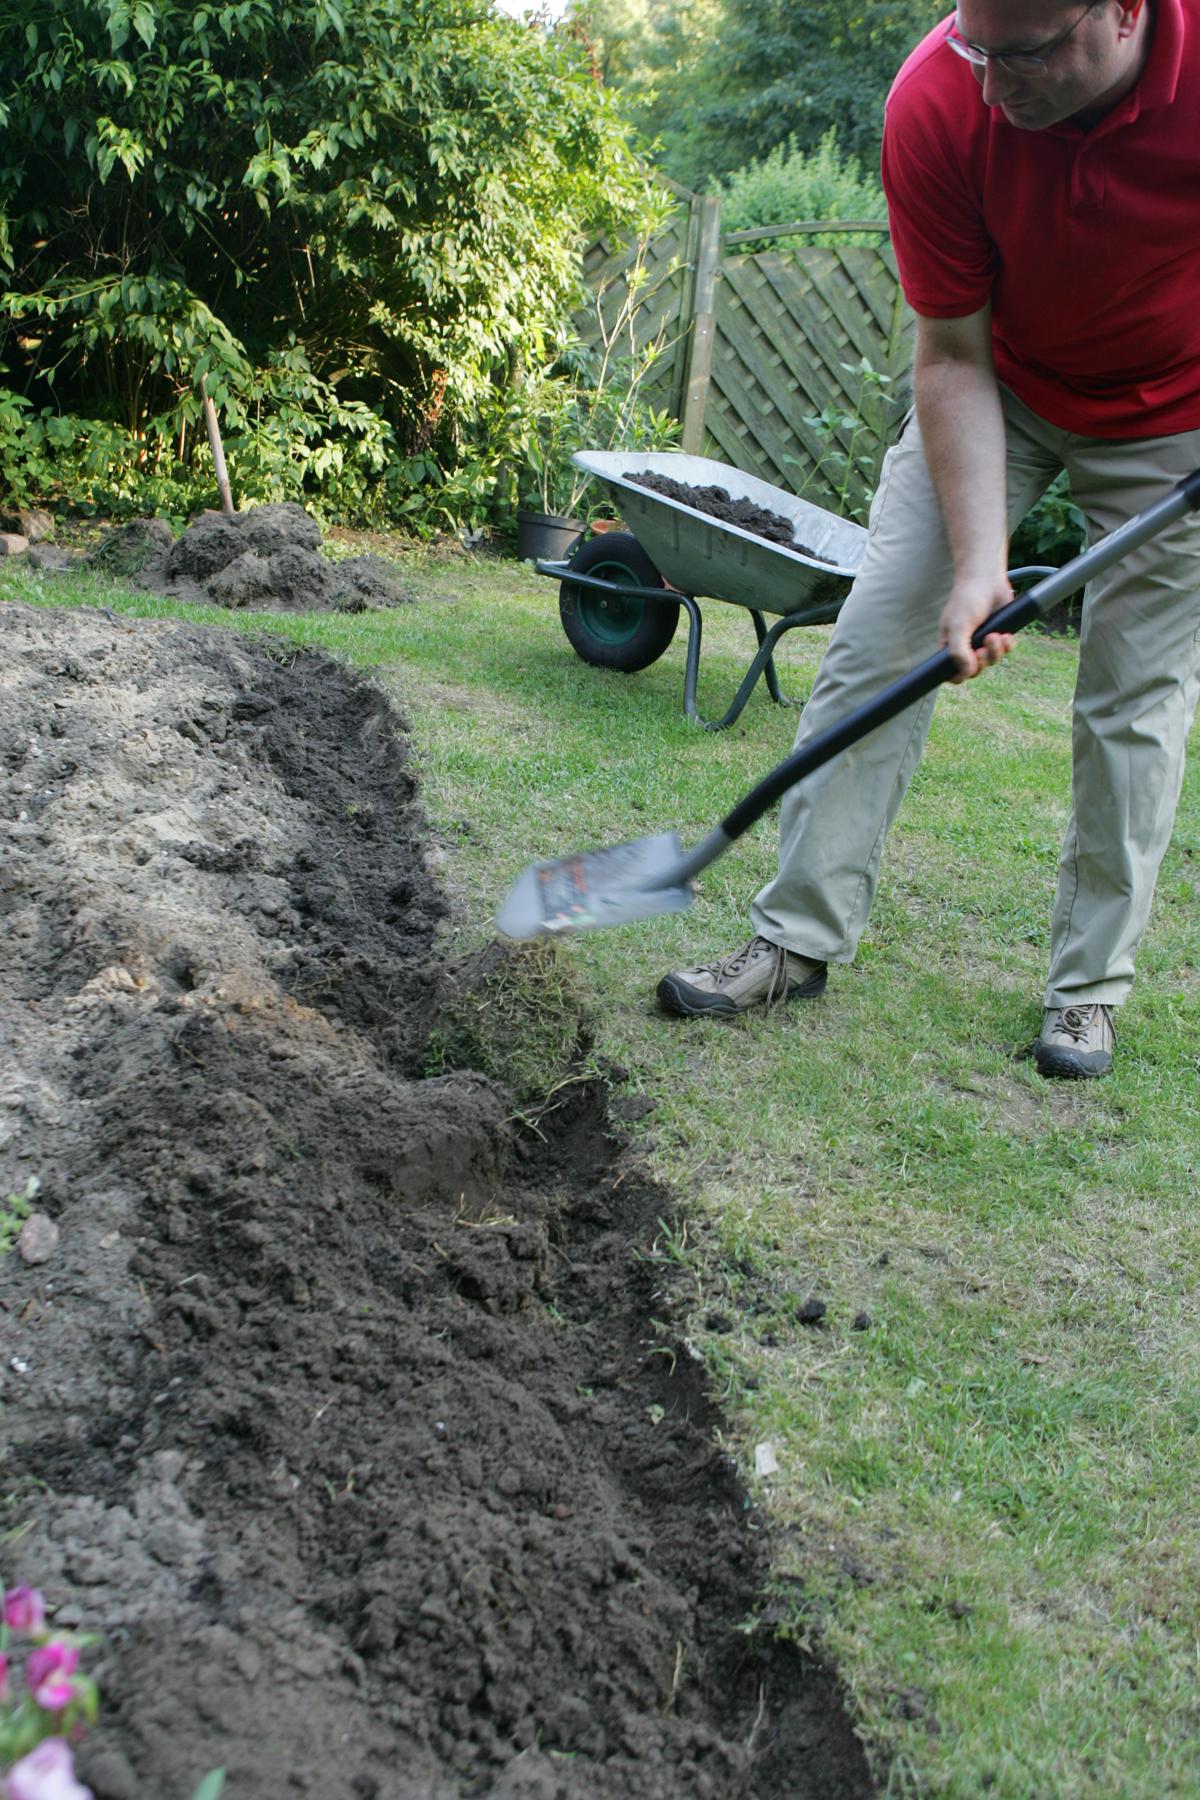 Fabelhaft Richtig Umgraben: Ran an die Beete, fertig, los! | Birchmeier #CC_14